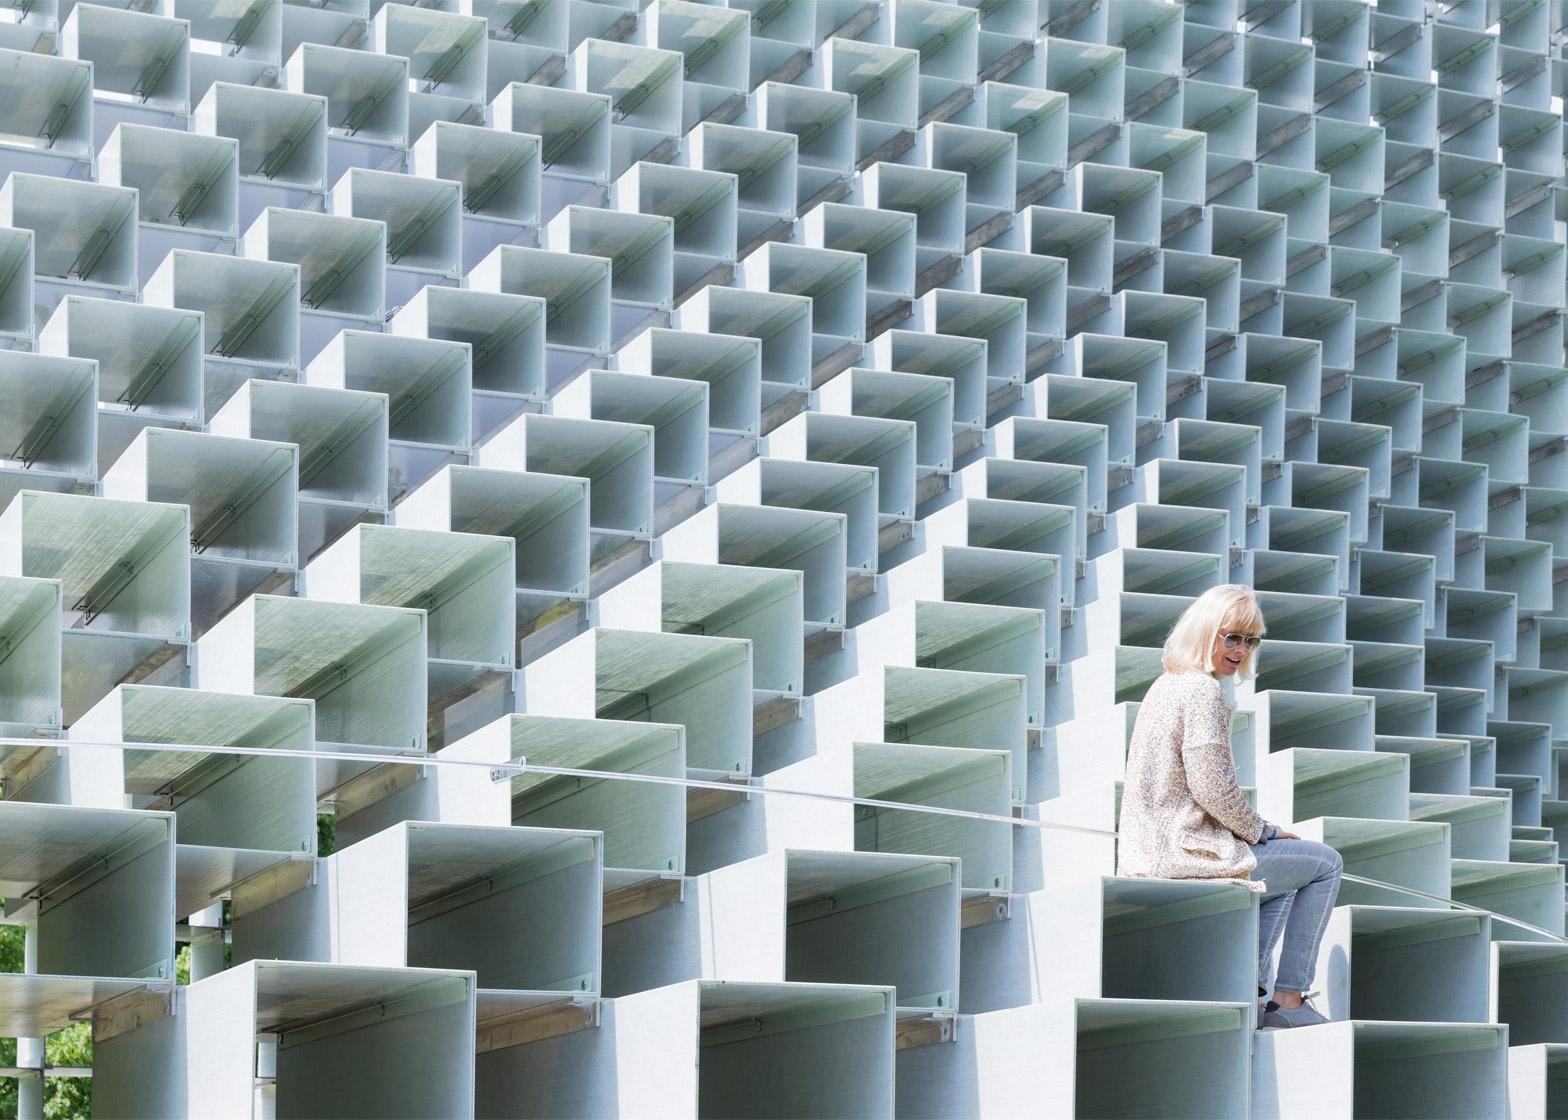 Bjarke Ingels' Serpentine Gallery Pavilion 2016